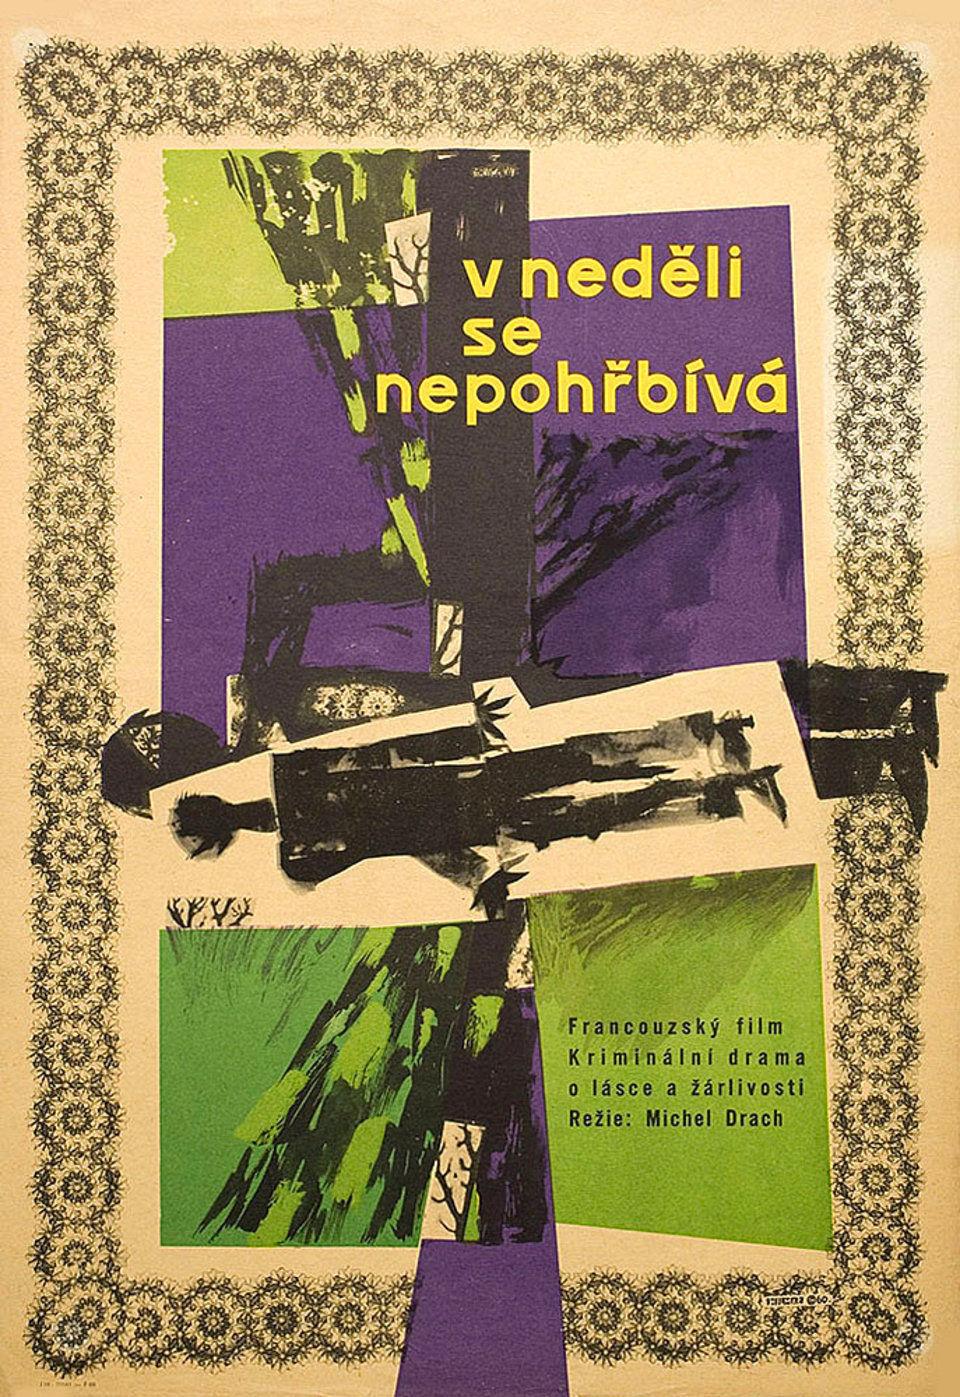 one-does-not-bury-sunday-1960s-original-czech-republic-movie-poster